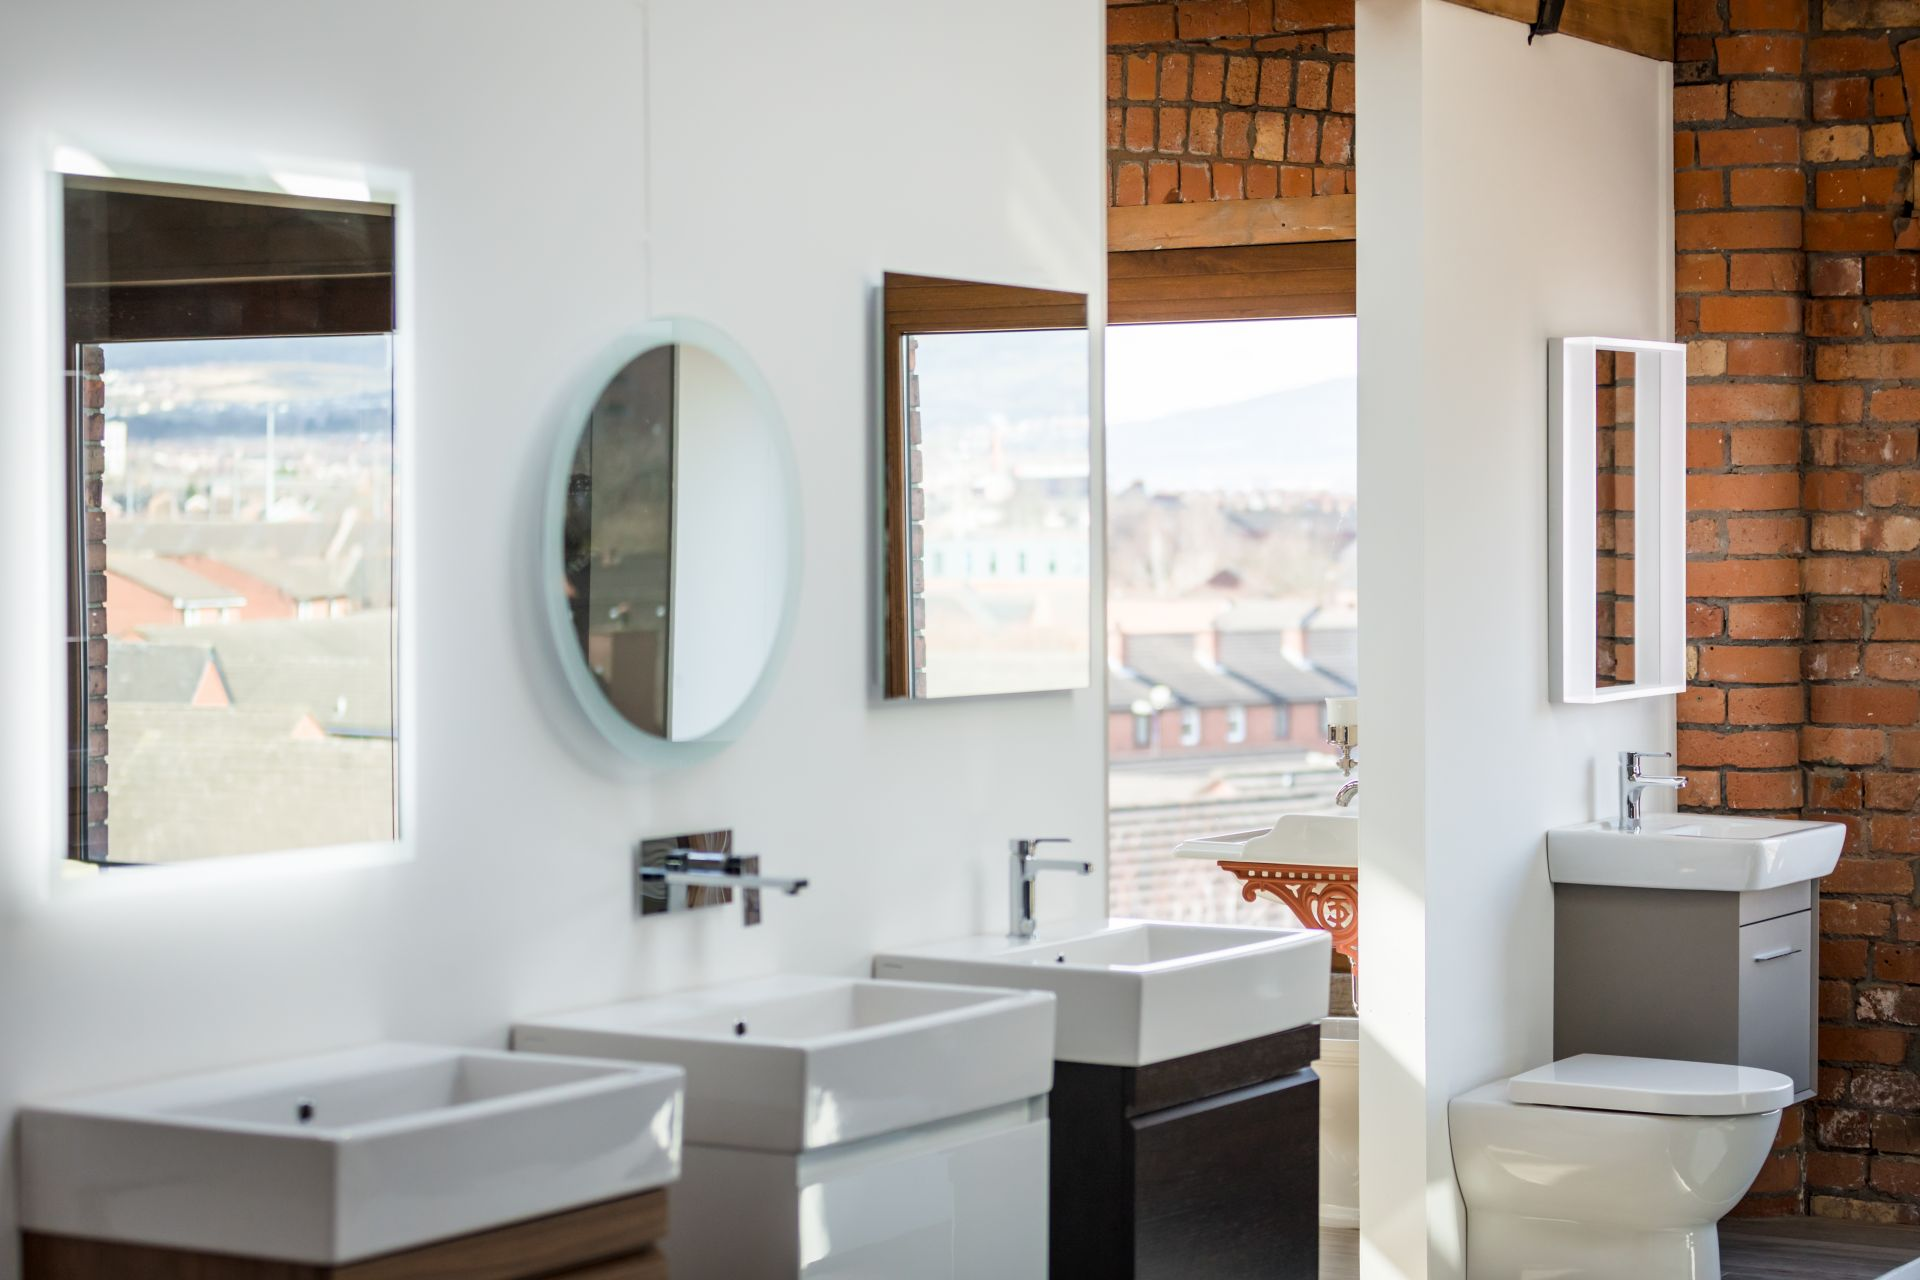 Bathrooms - David Scott